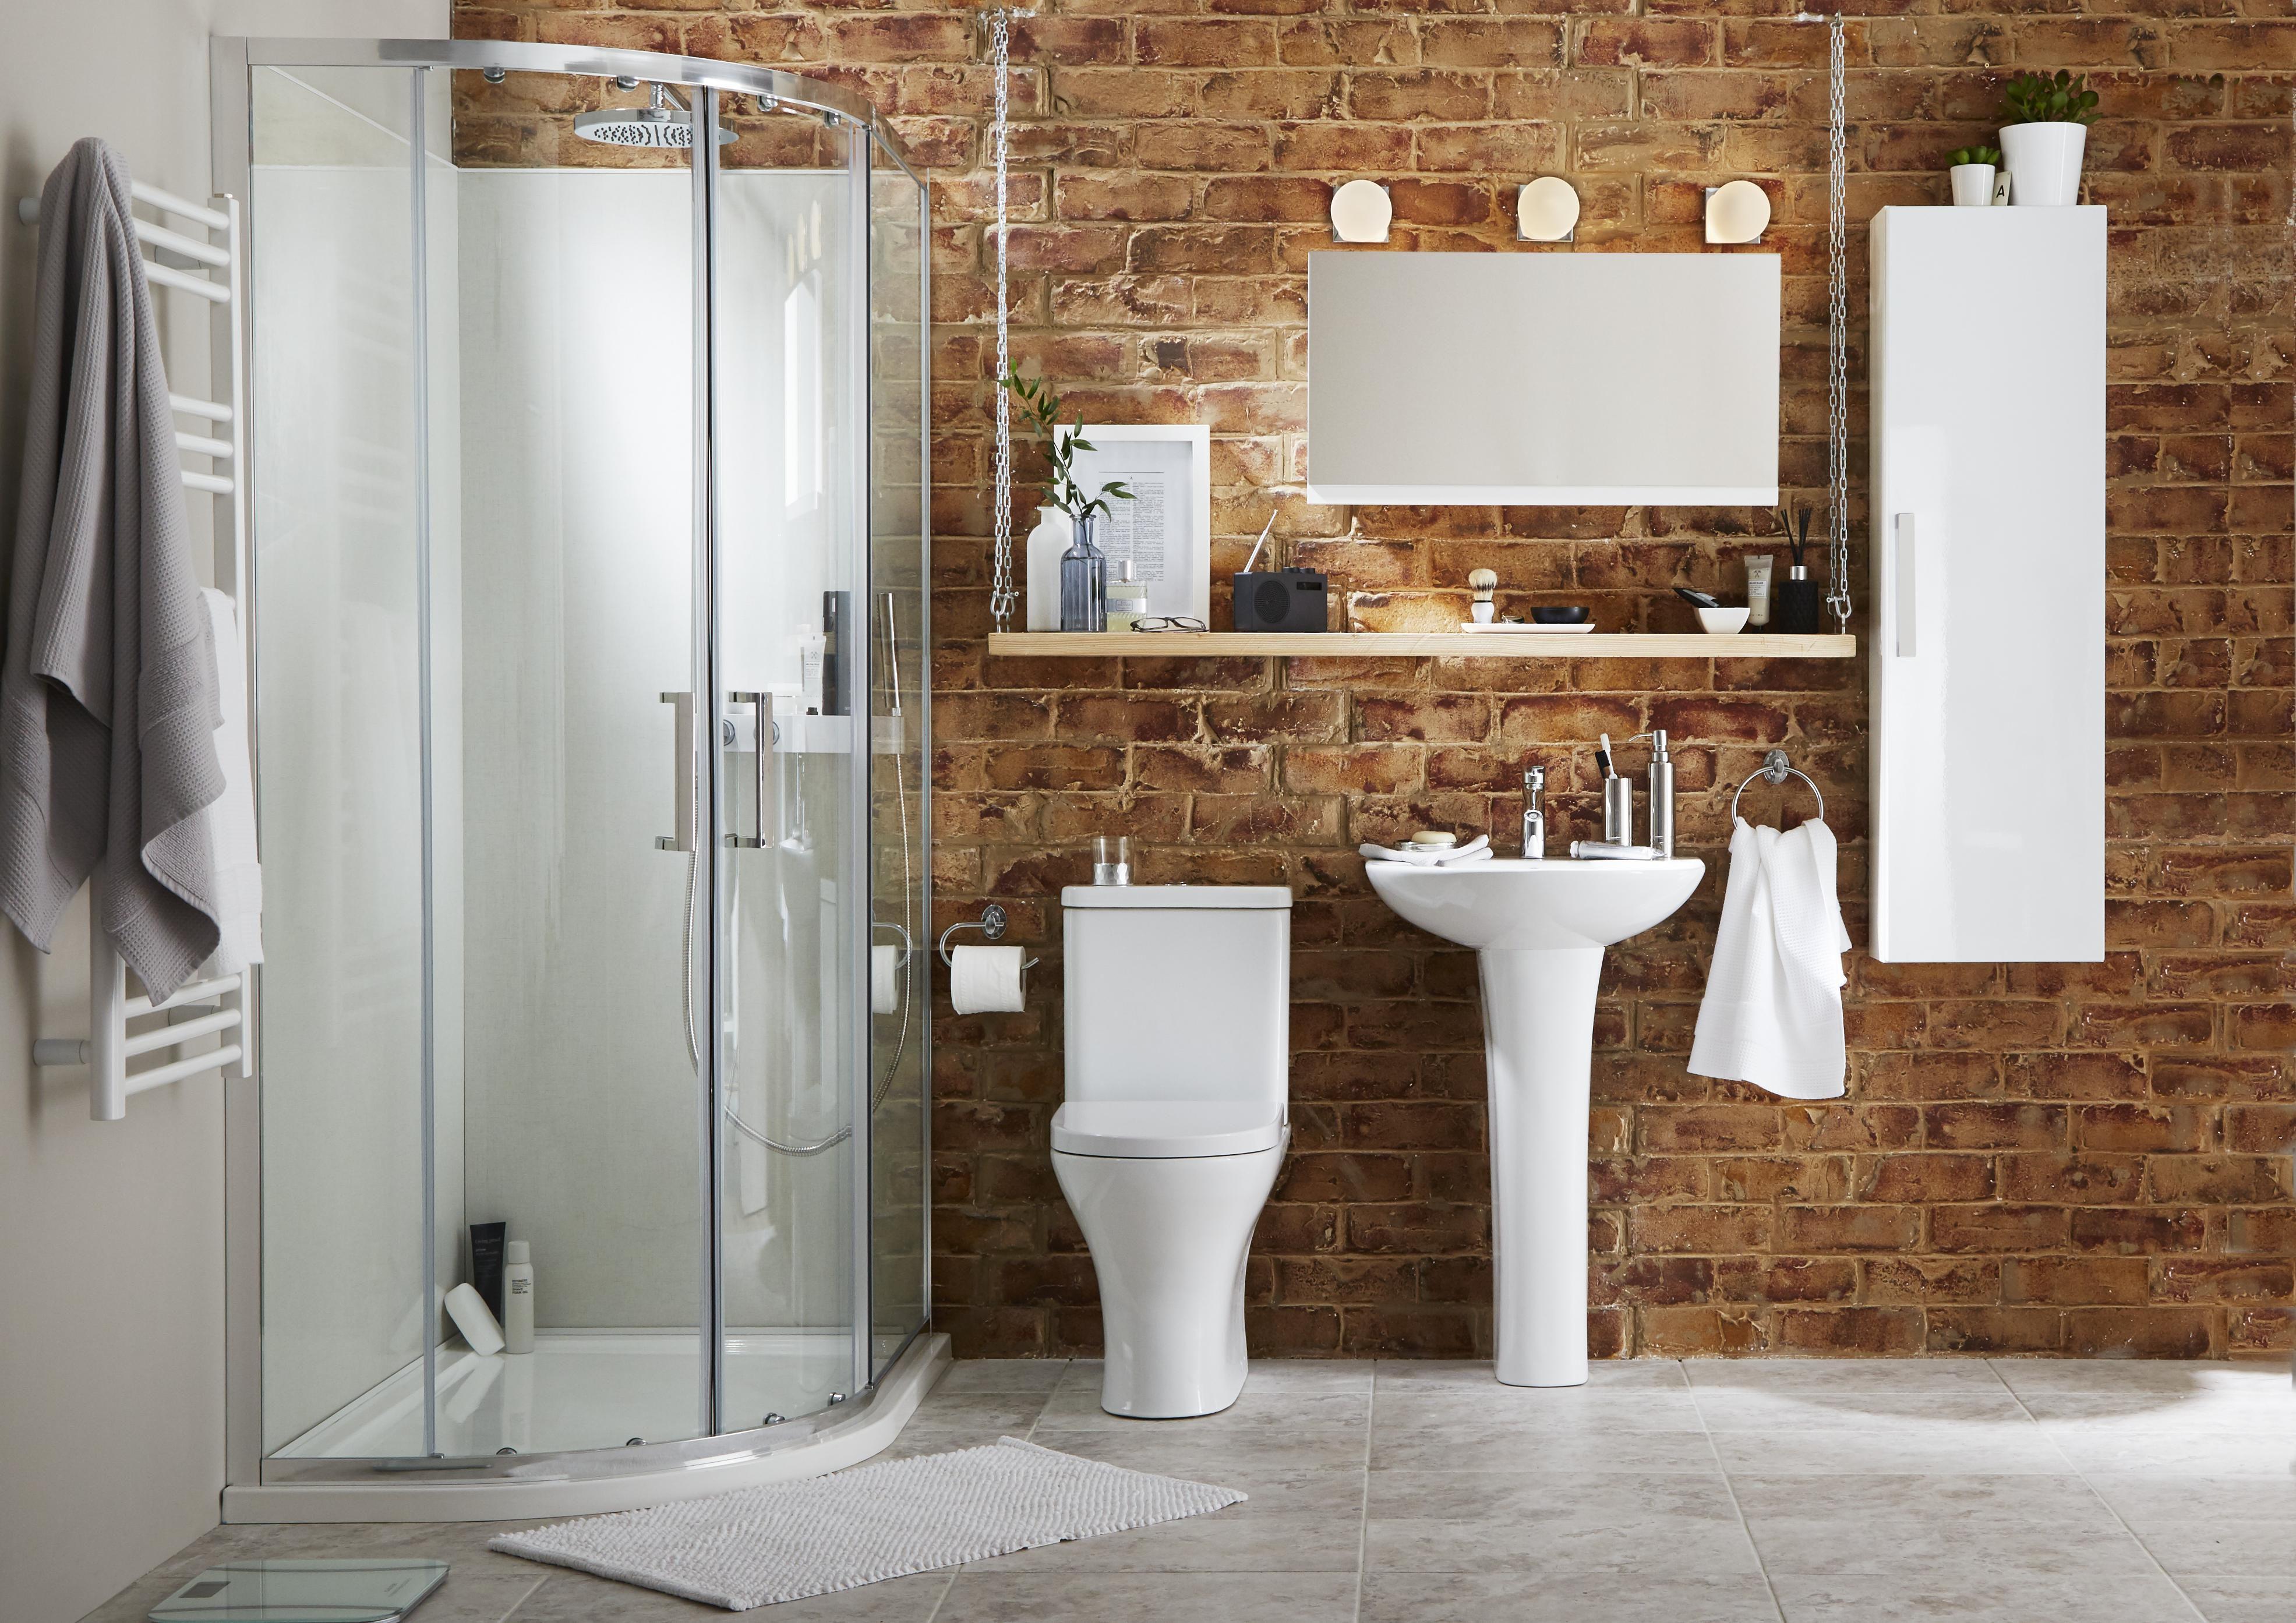 Bathroom Suites Complete Bathroom Suites DIY at BQ